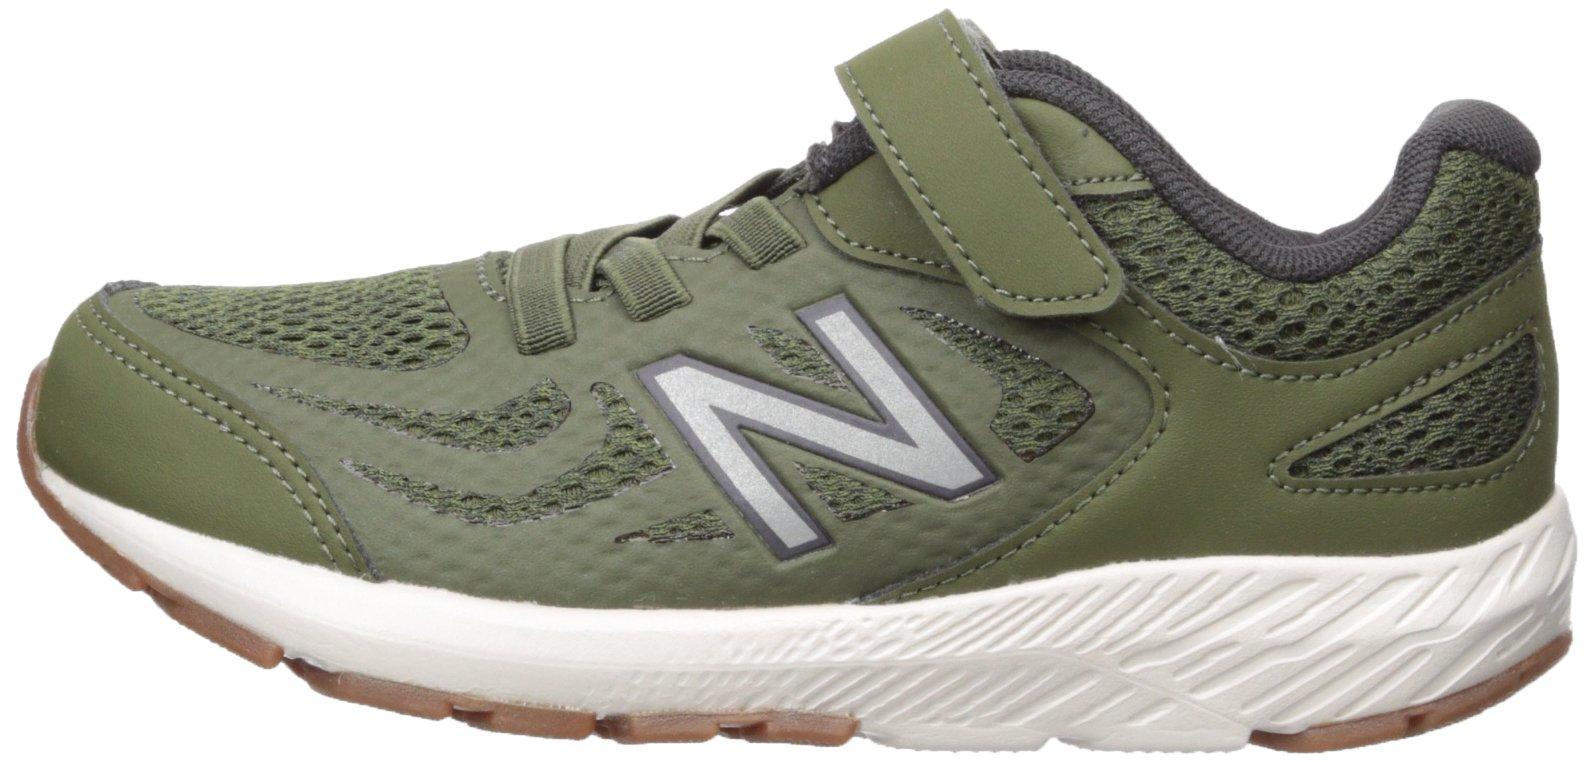 New Balance Boys' 519v1 Hook and Loop Running Shoe Dark Covert Green/Phantom 2 M US Infant by New Balance (Image #5)